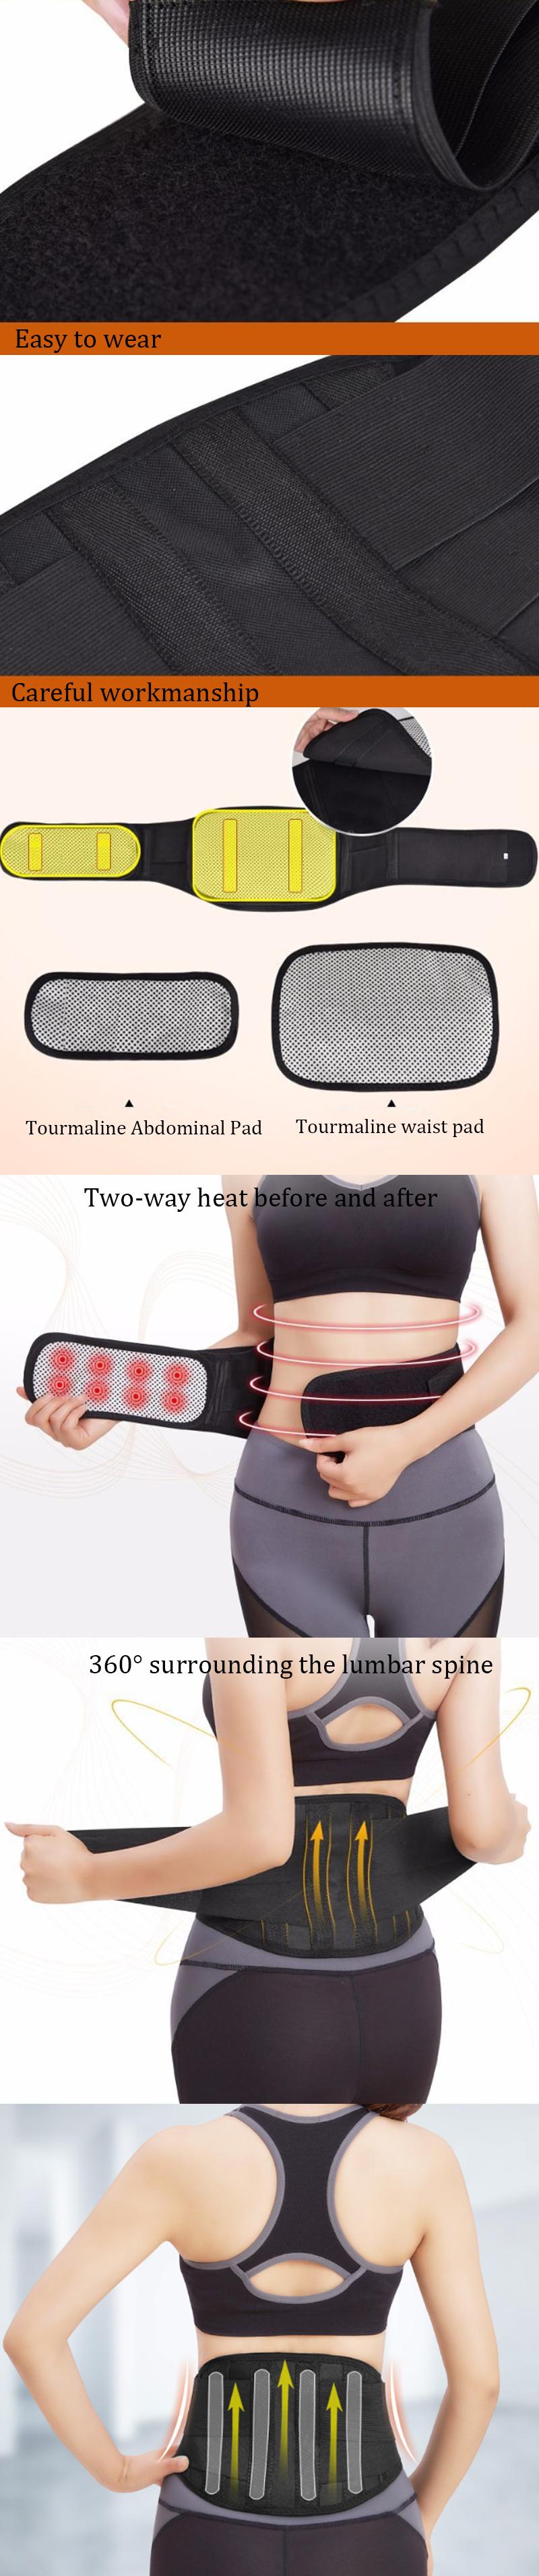 KALOAD Lumbar Support Fitness Sports Exercise Self-heating Waist Belt Training Waist Protector Belly Shaper Waist Trainer